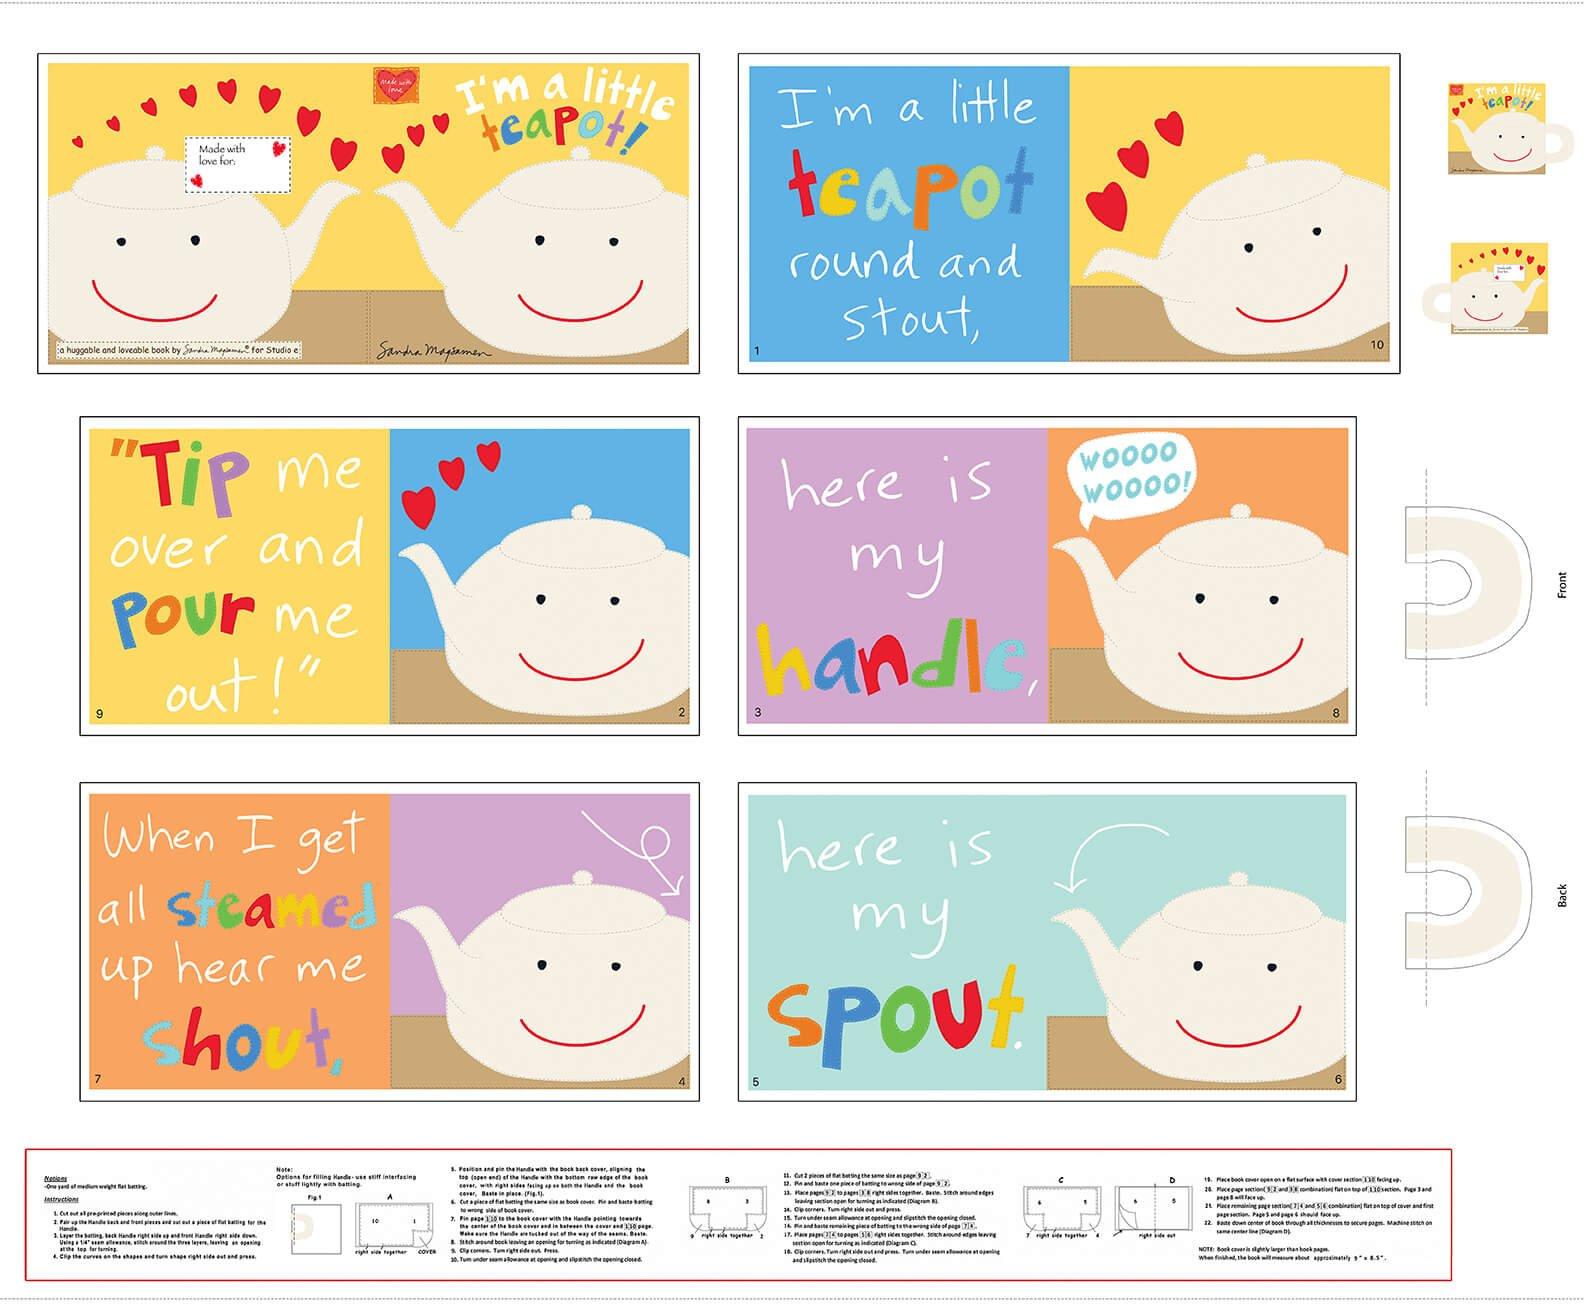 Hug&love IX Teapot Book 5529P-1